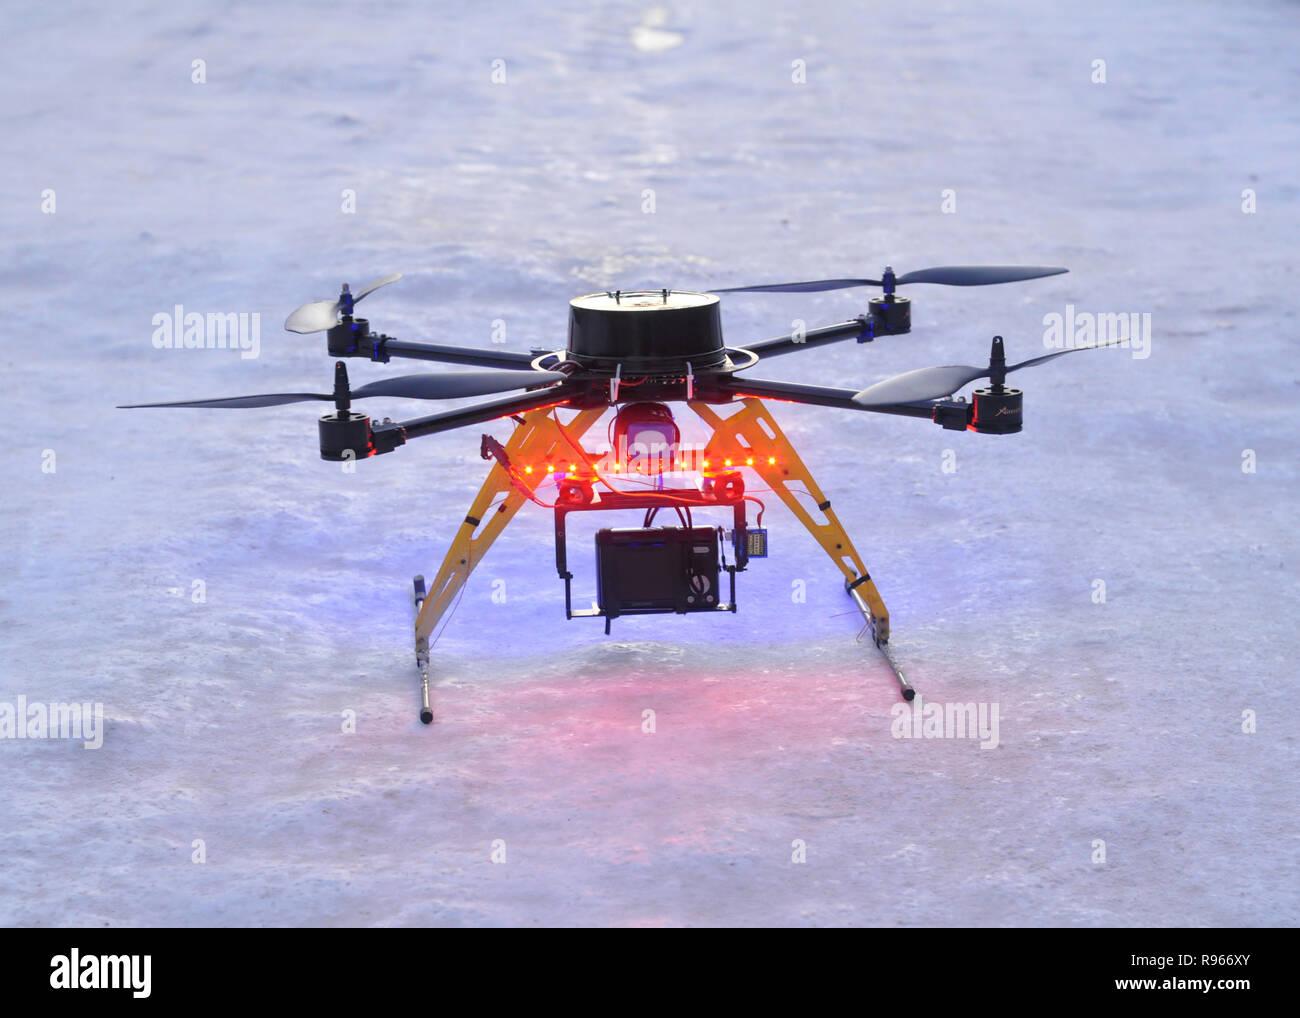 Kovrov, Russia. 16 December 2012. Hexacopter prepared for flight - Stock Image